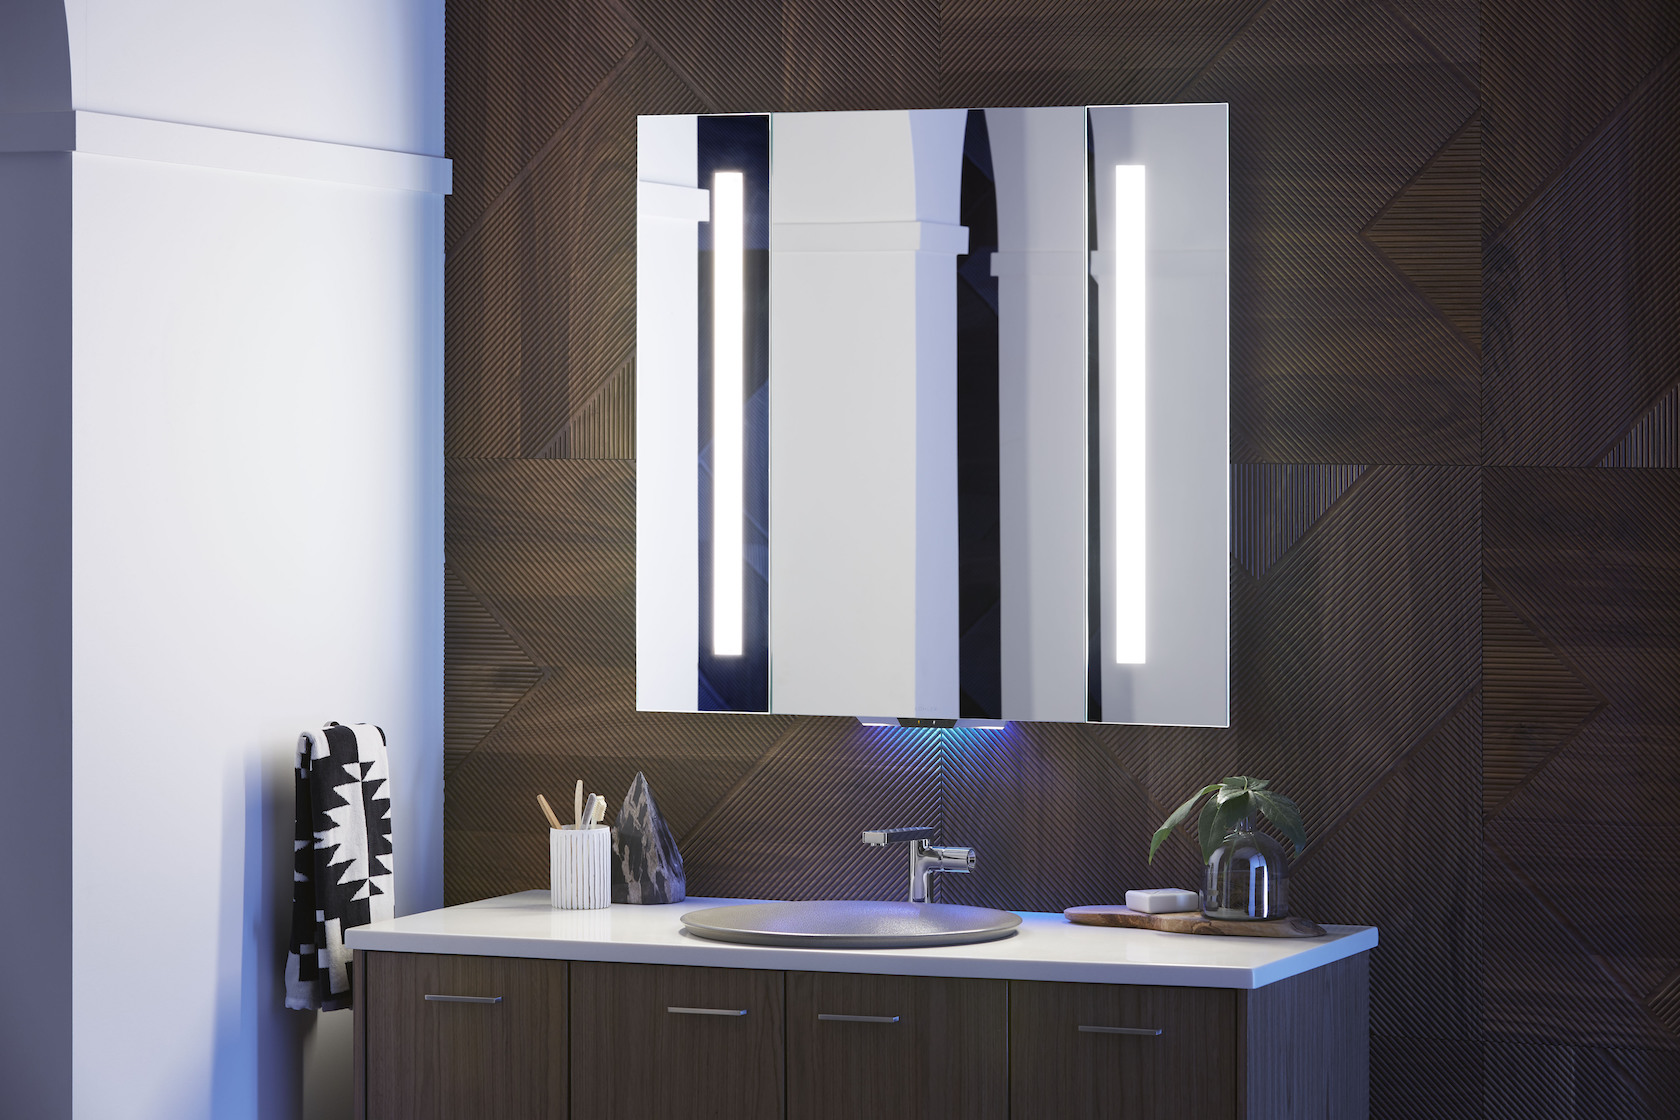 kohler-alexa-smart-mirror